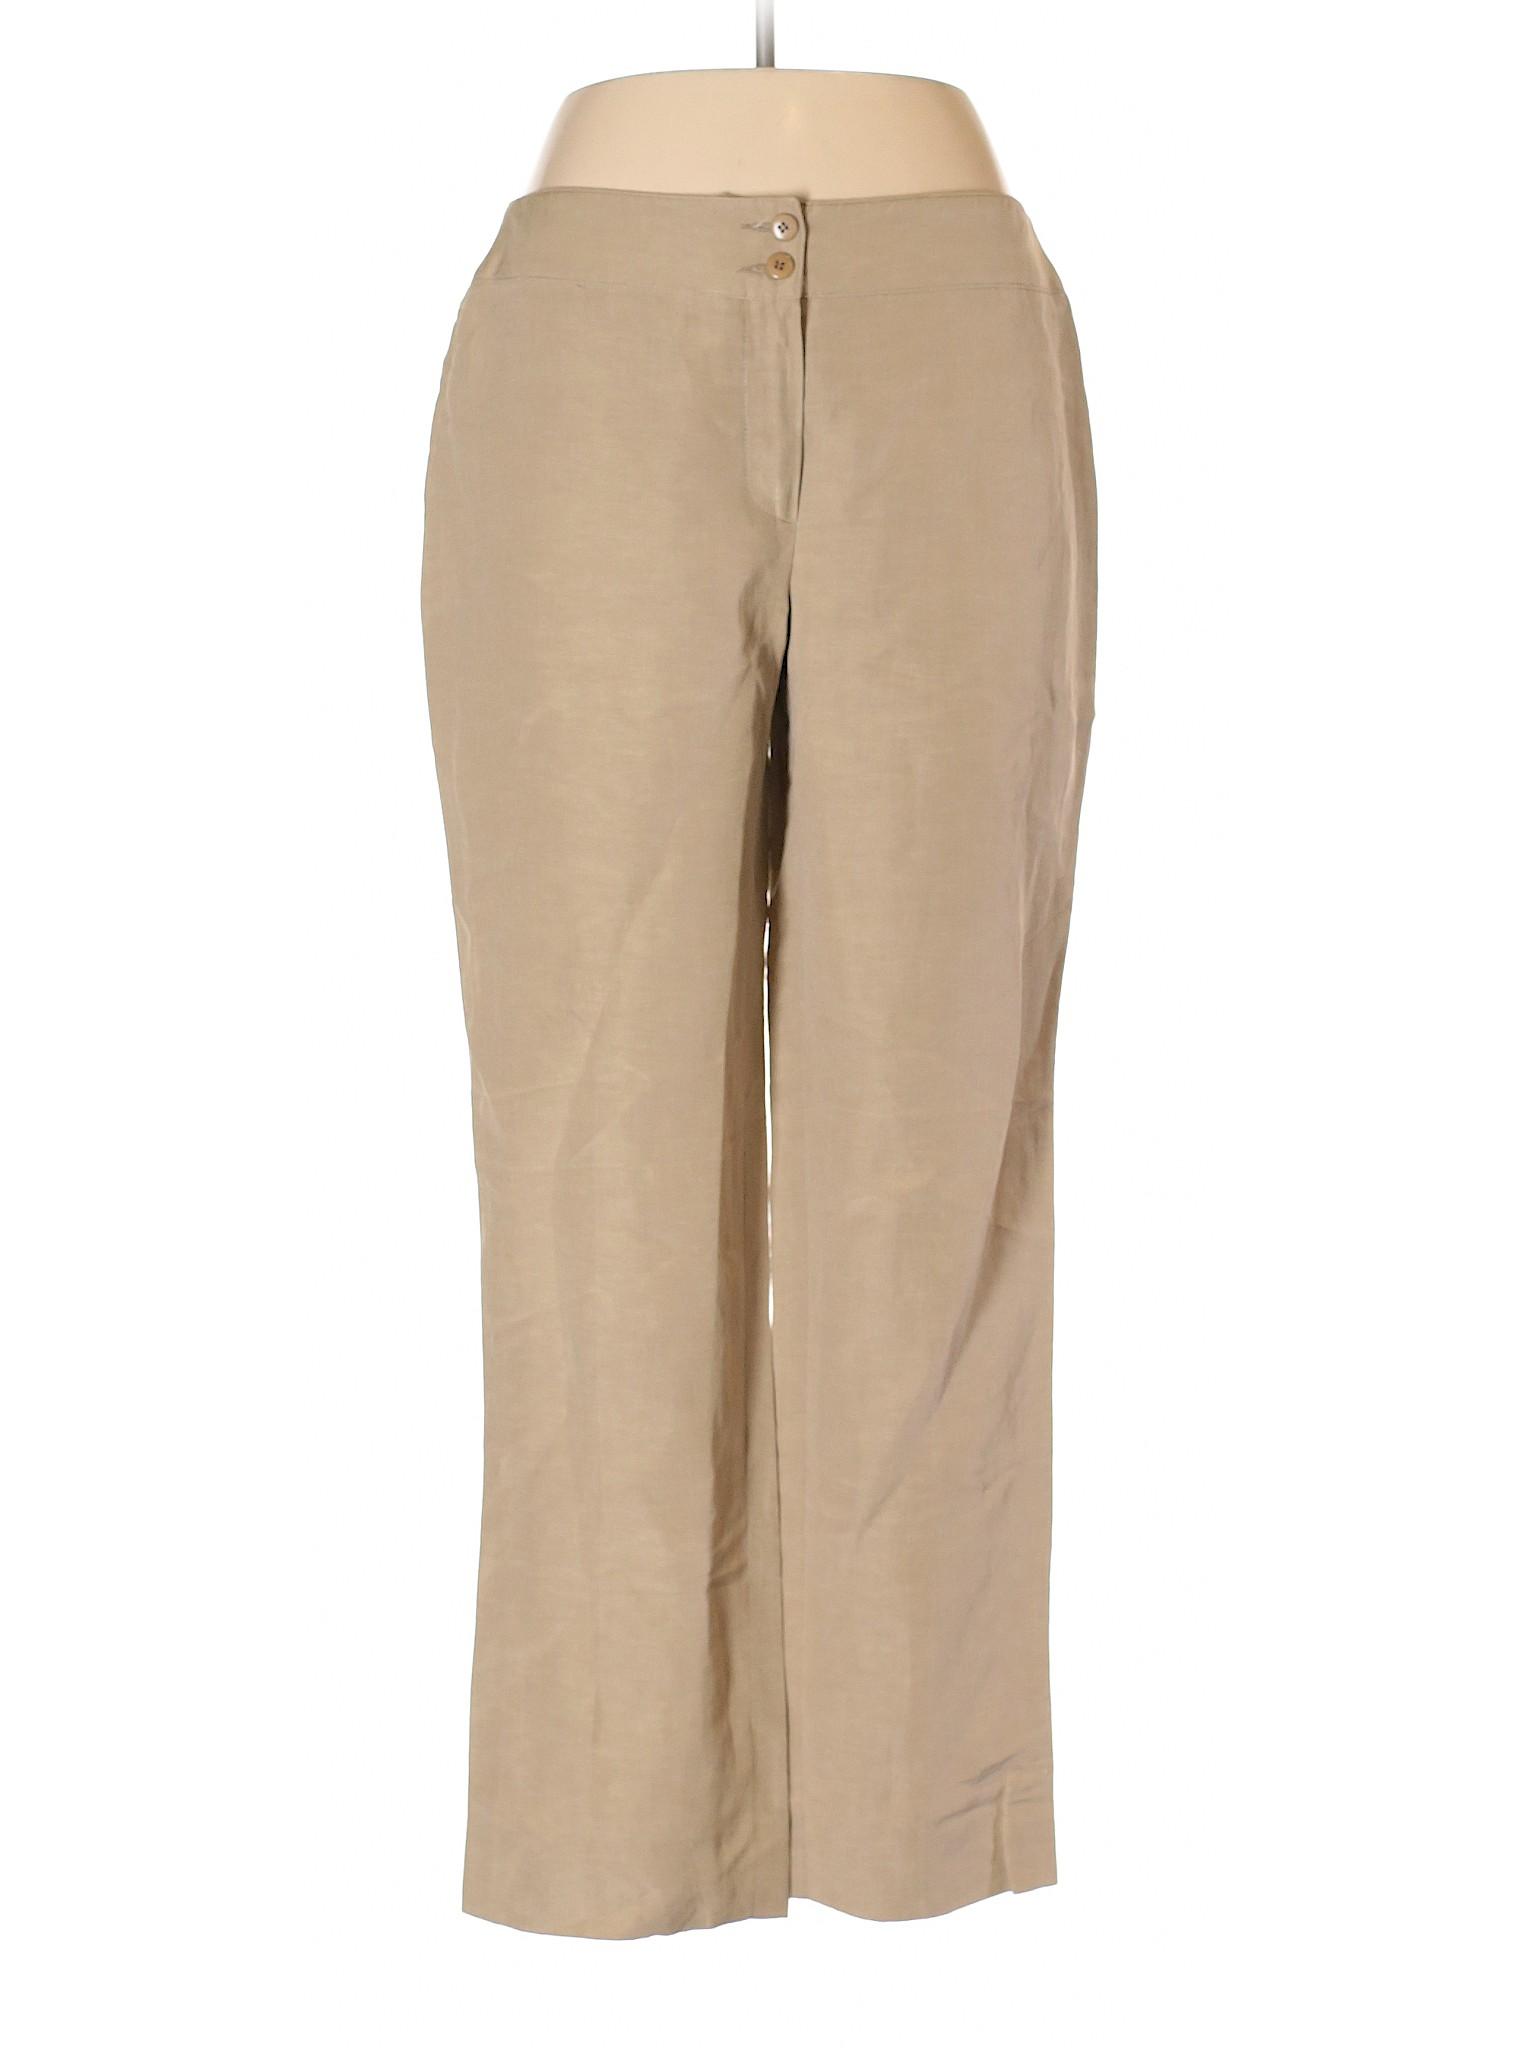 Collezioni winter Boutique Pants Linen Armani wCBq6E4